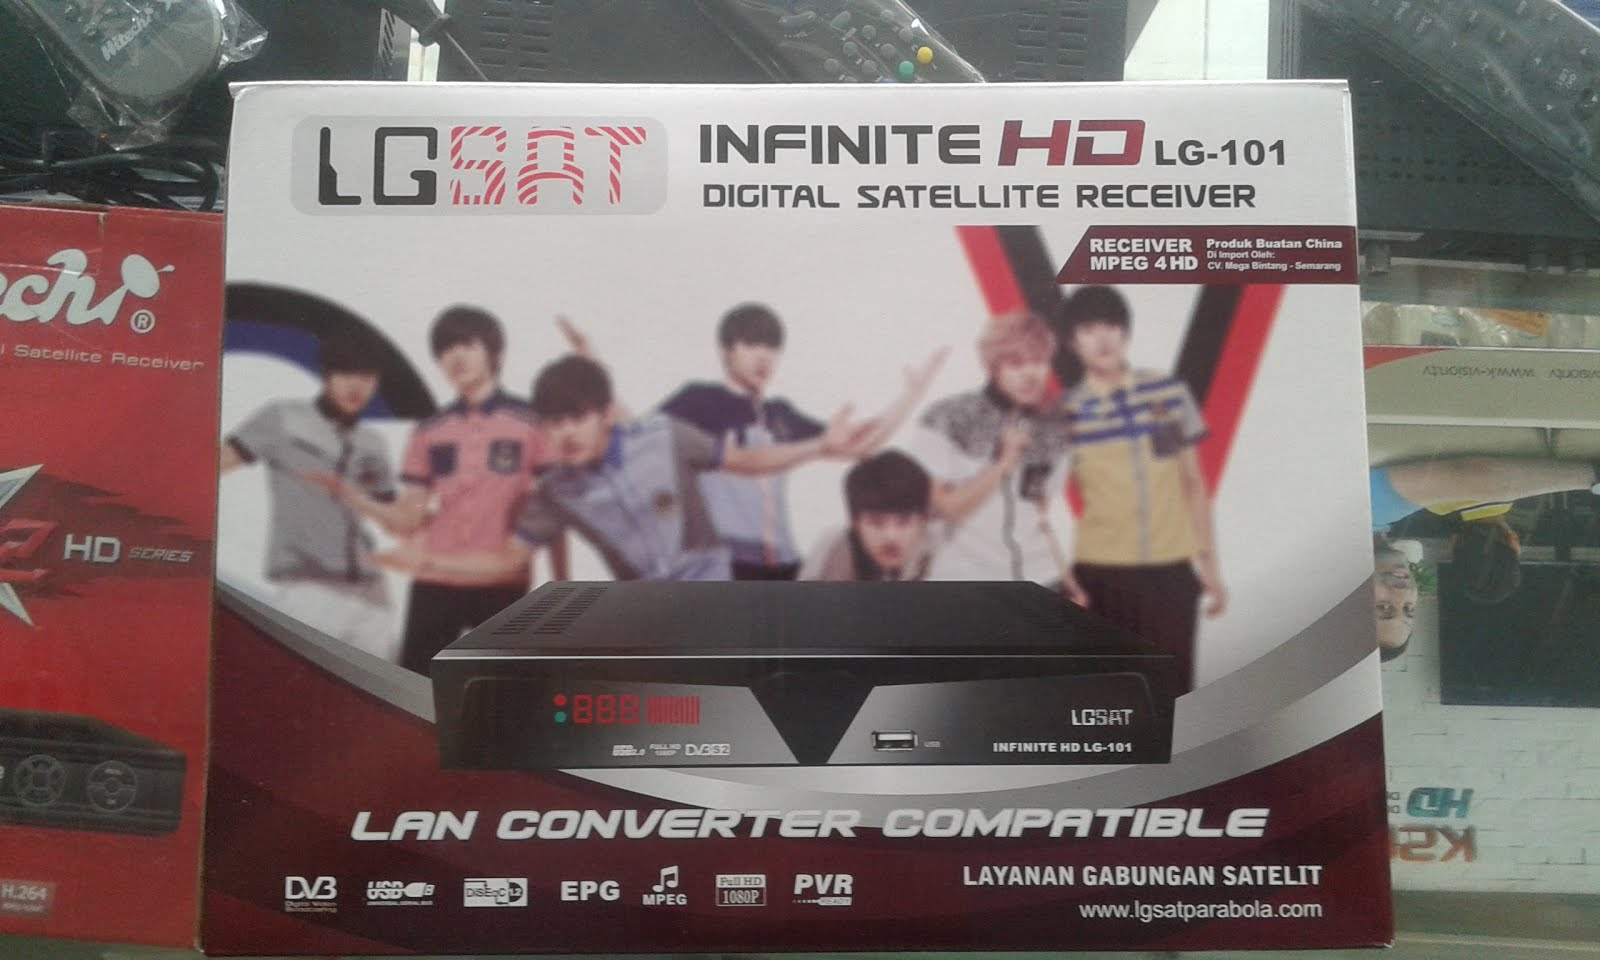 LGSat INFINITE HD